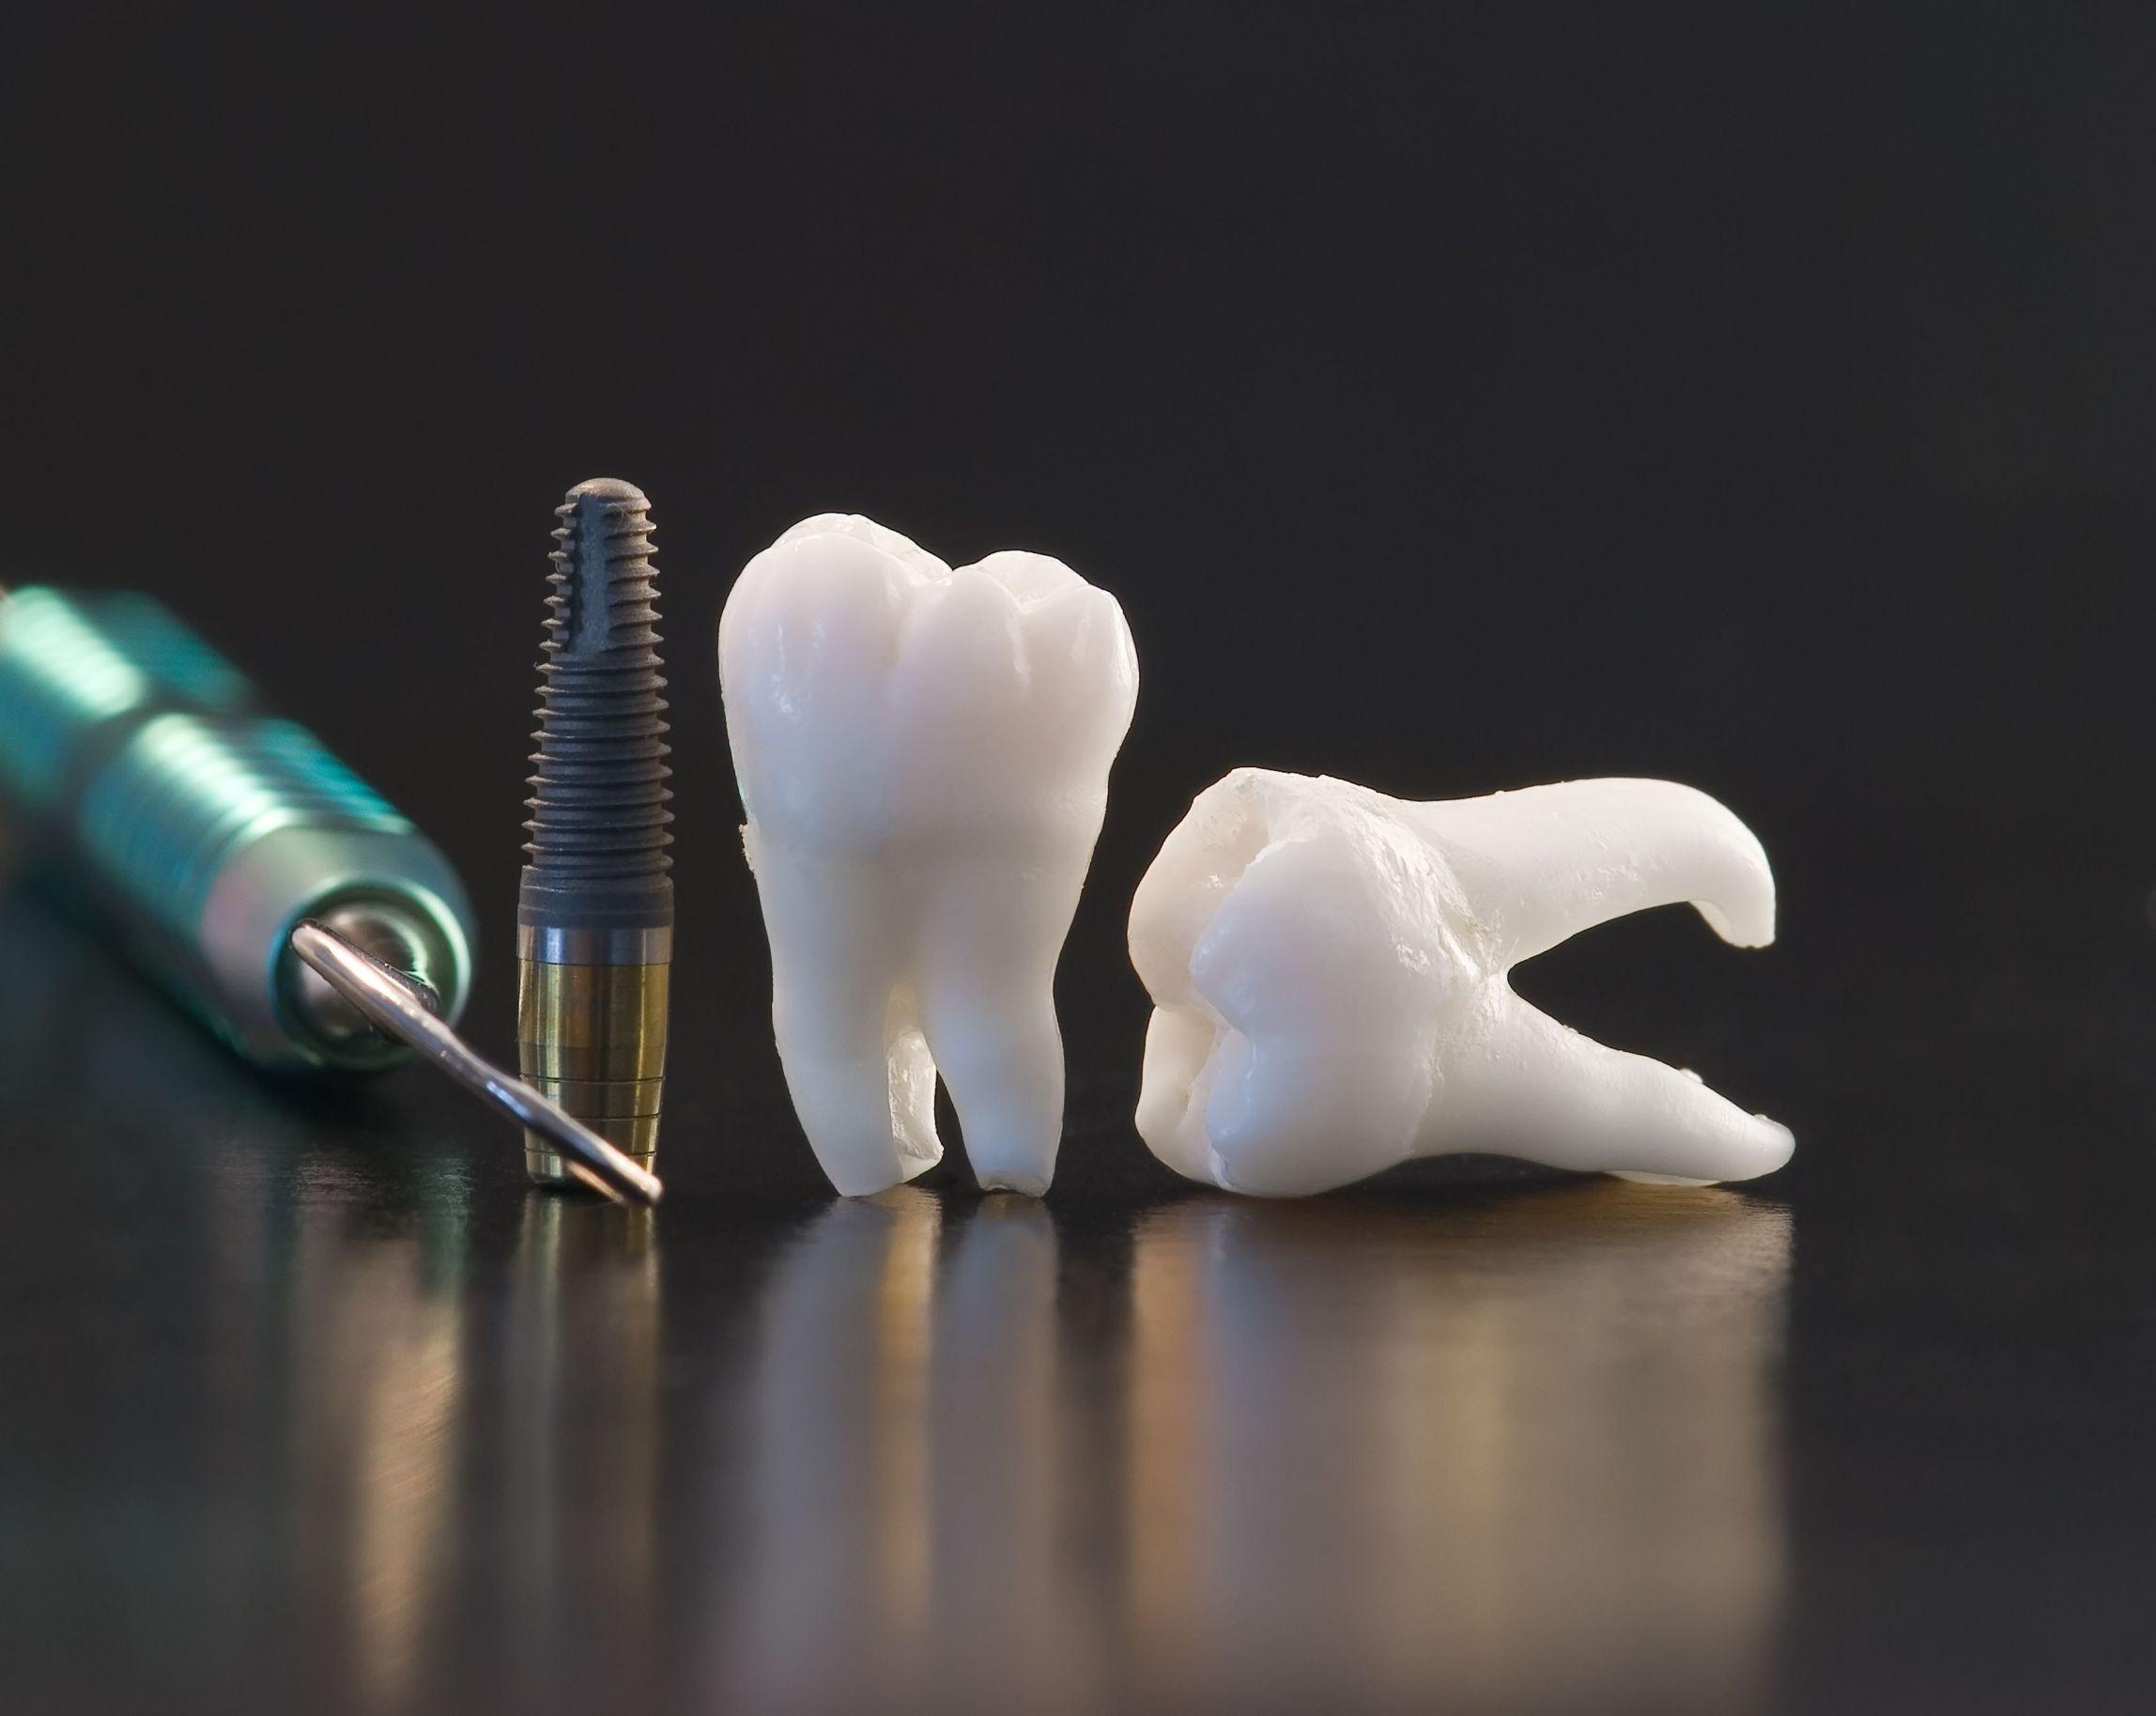 Dentist Wallpapers   Top Dentist Backgrounds   WallpaperAccess 2296x1827